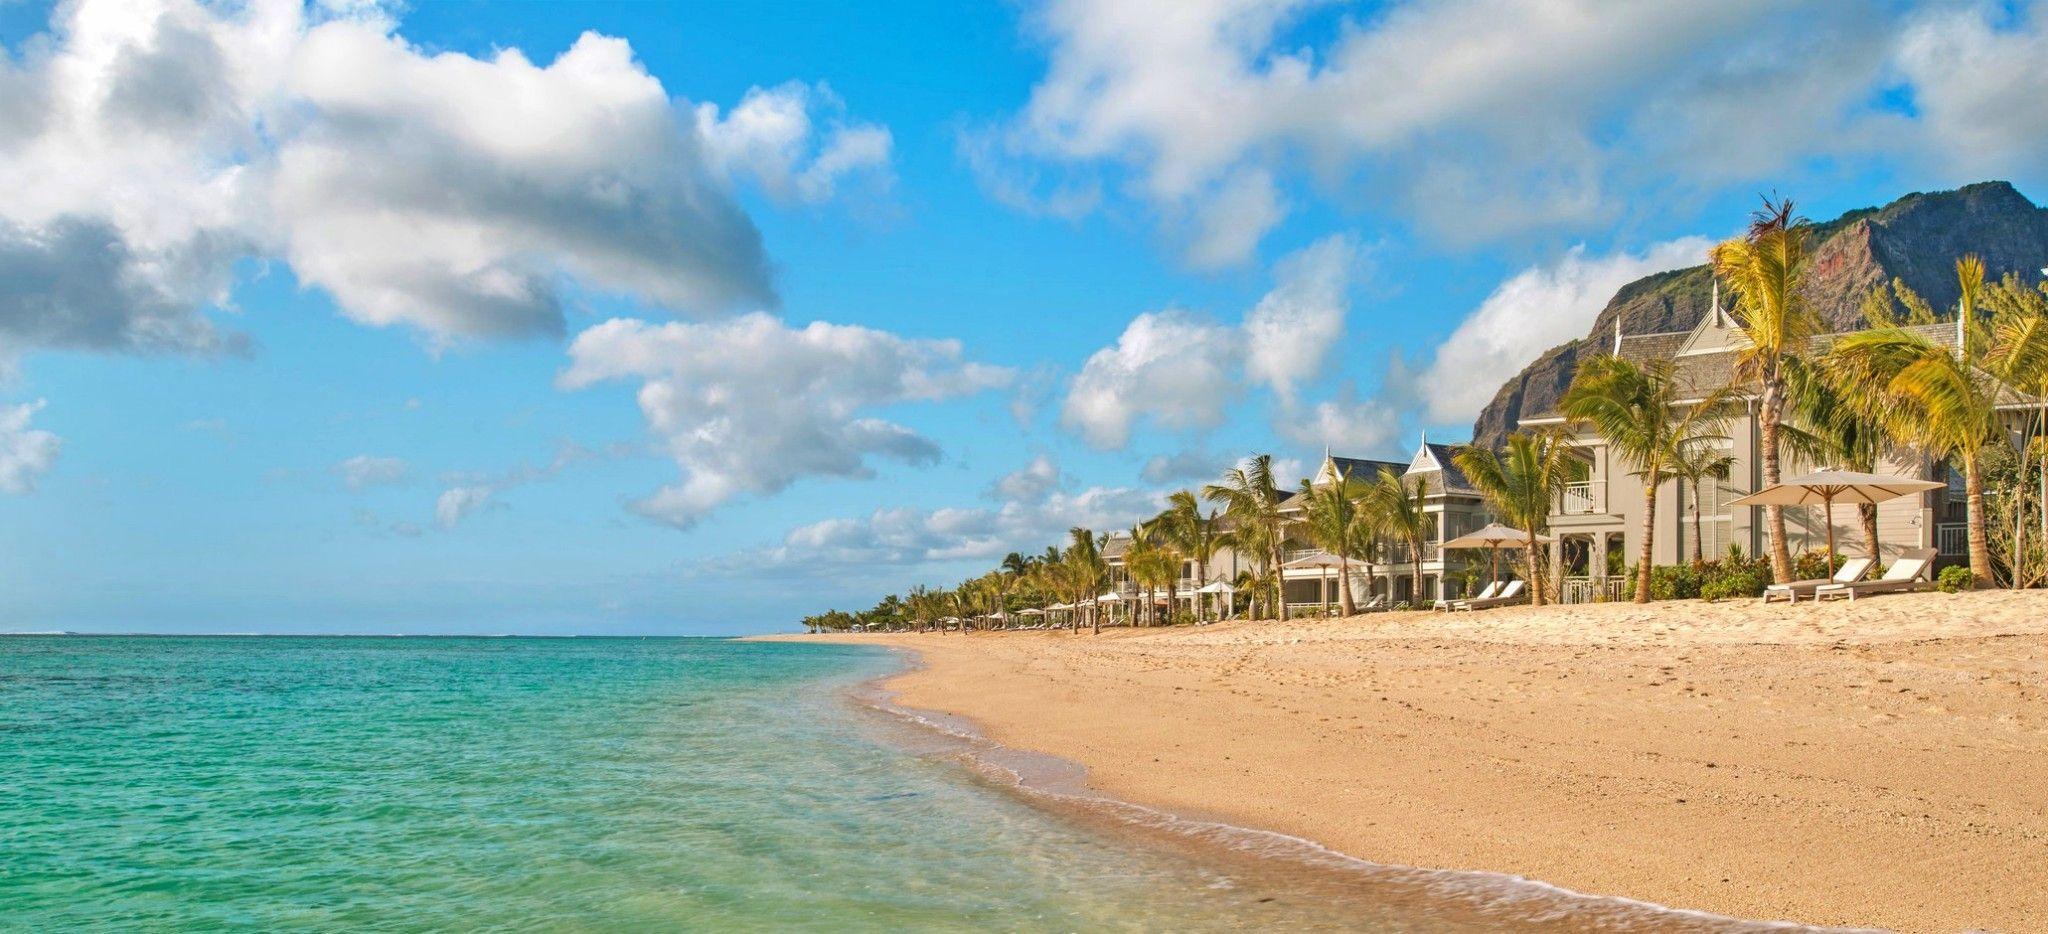 "Ein Strand auf Mauritius, dahinter das Hotel ""St. Regis Mauritius"""